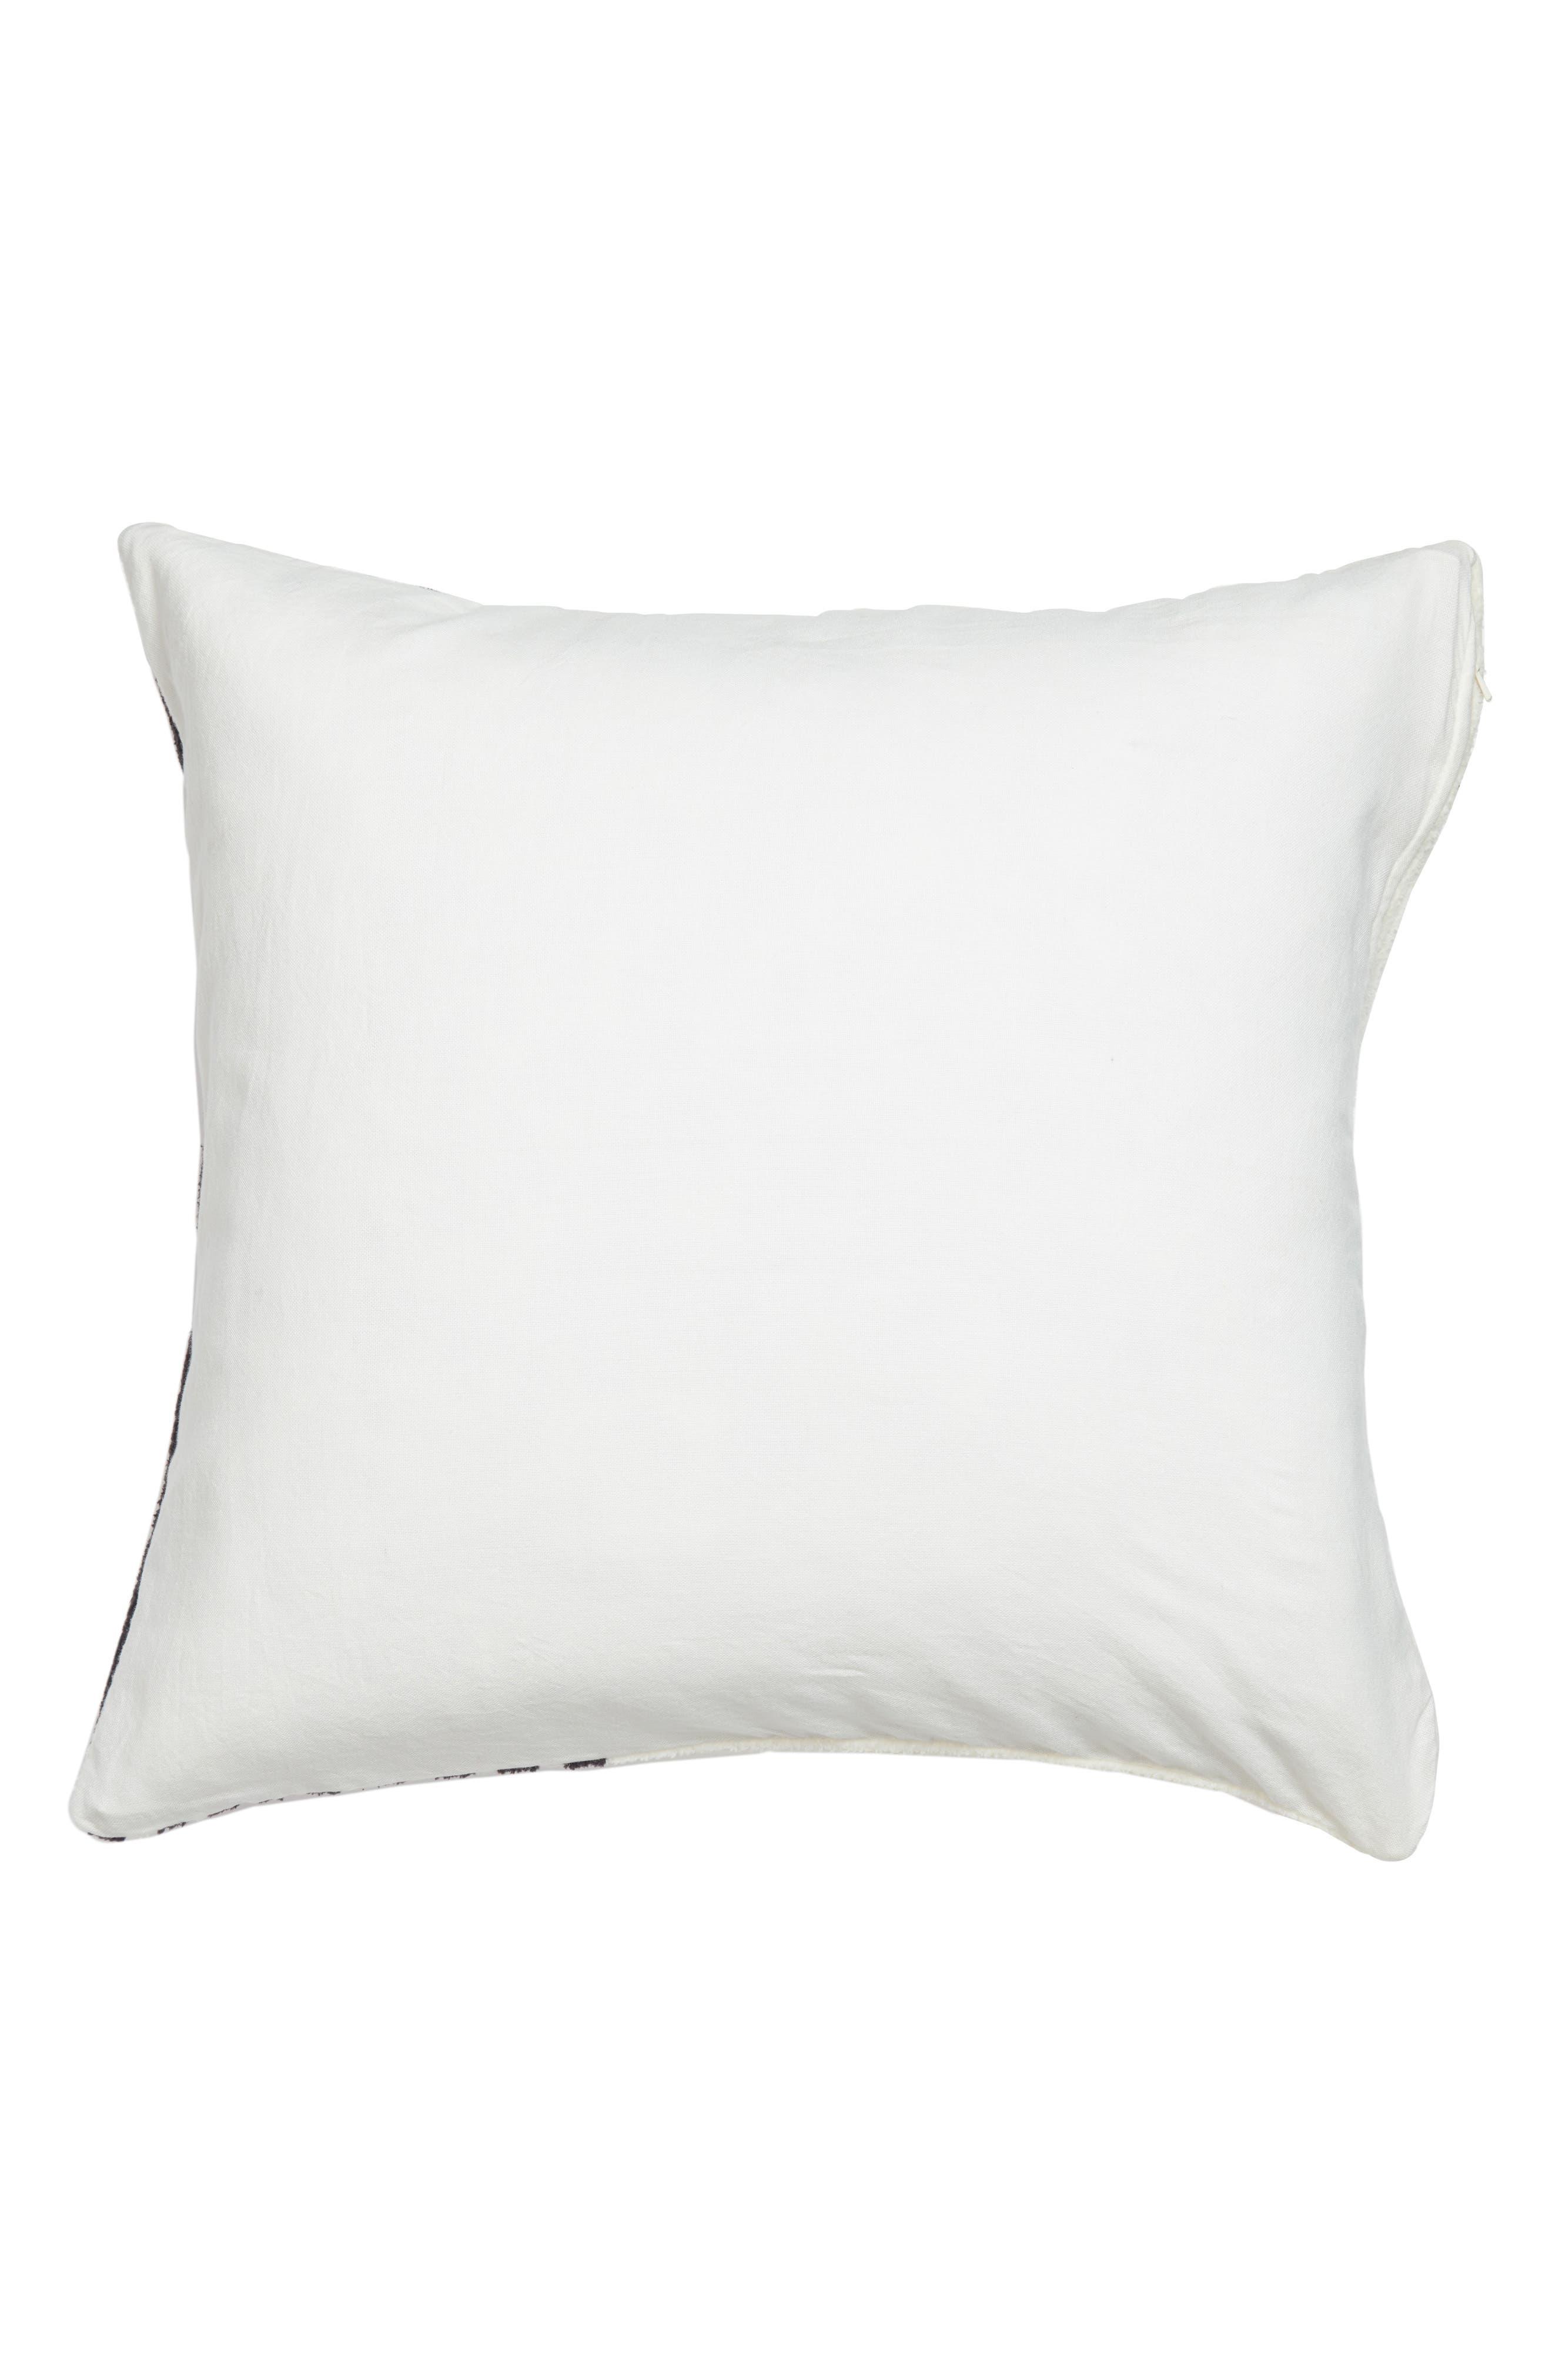 Hammam Stripe Accent Pillow,                             Alternate thumbnail 6, color,